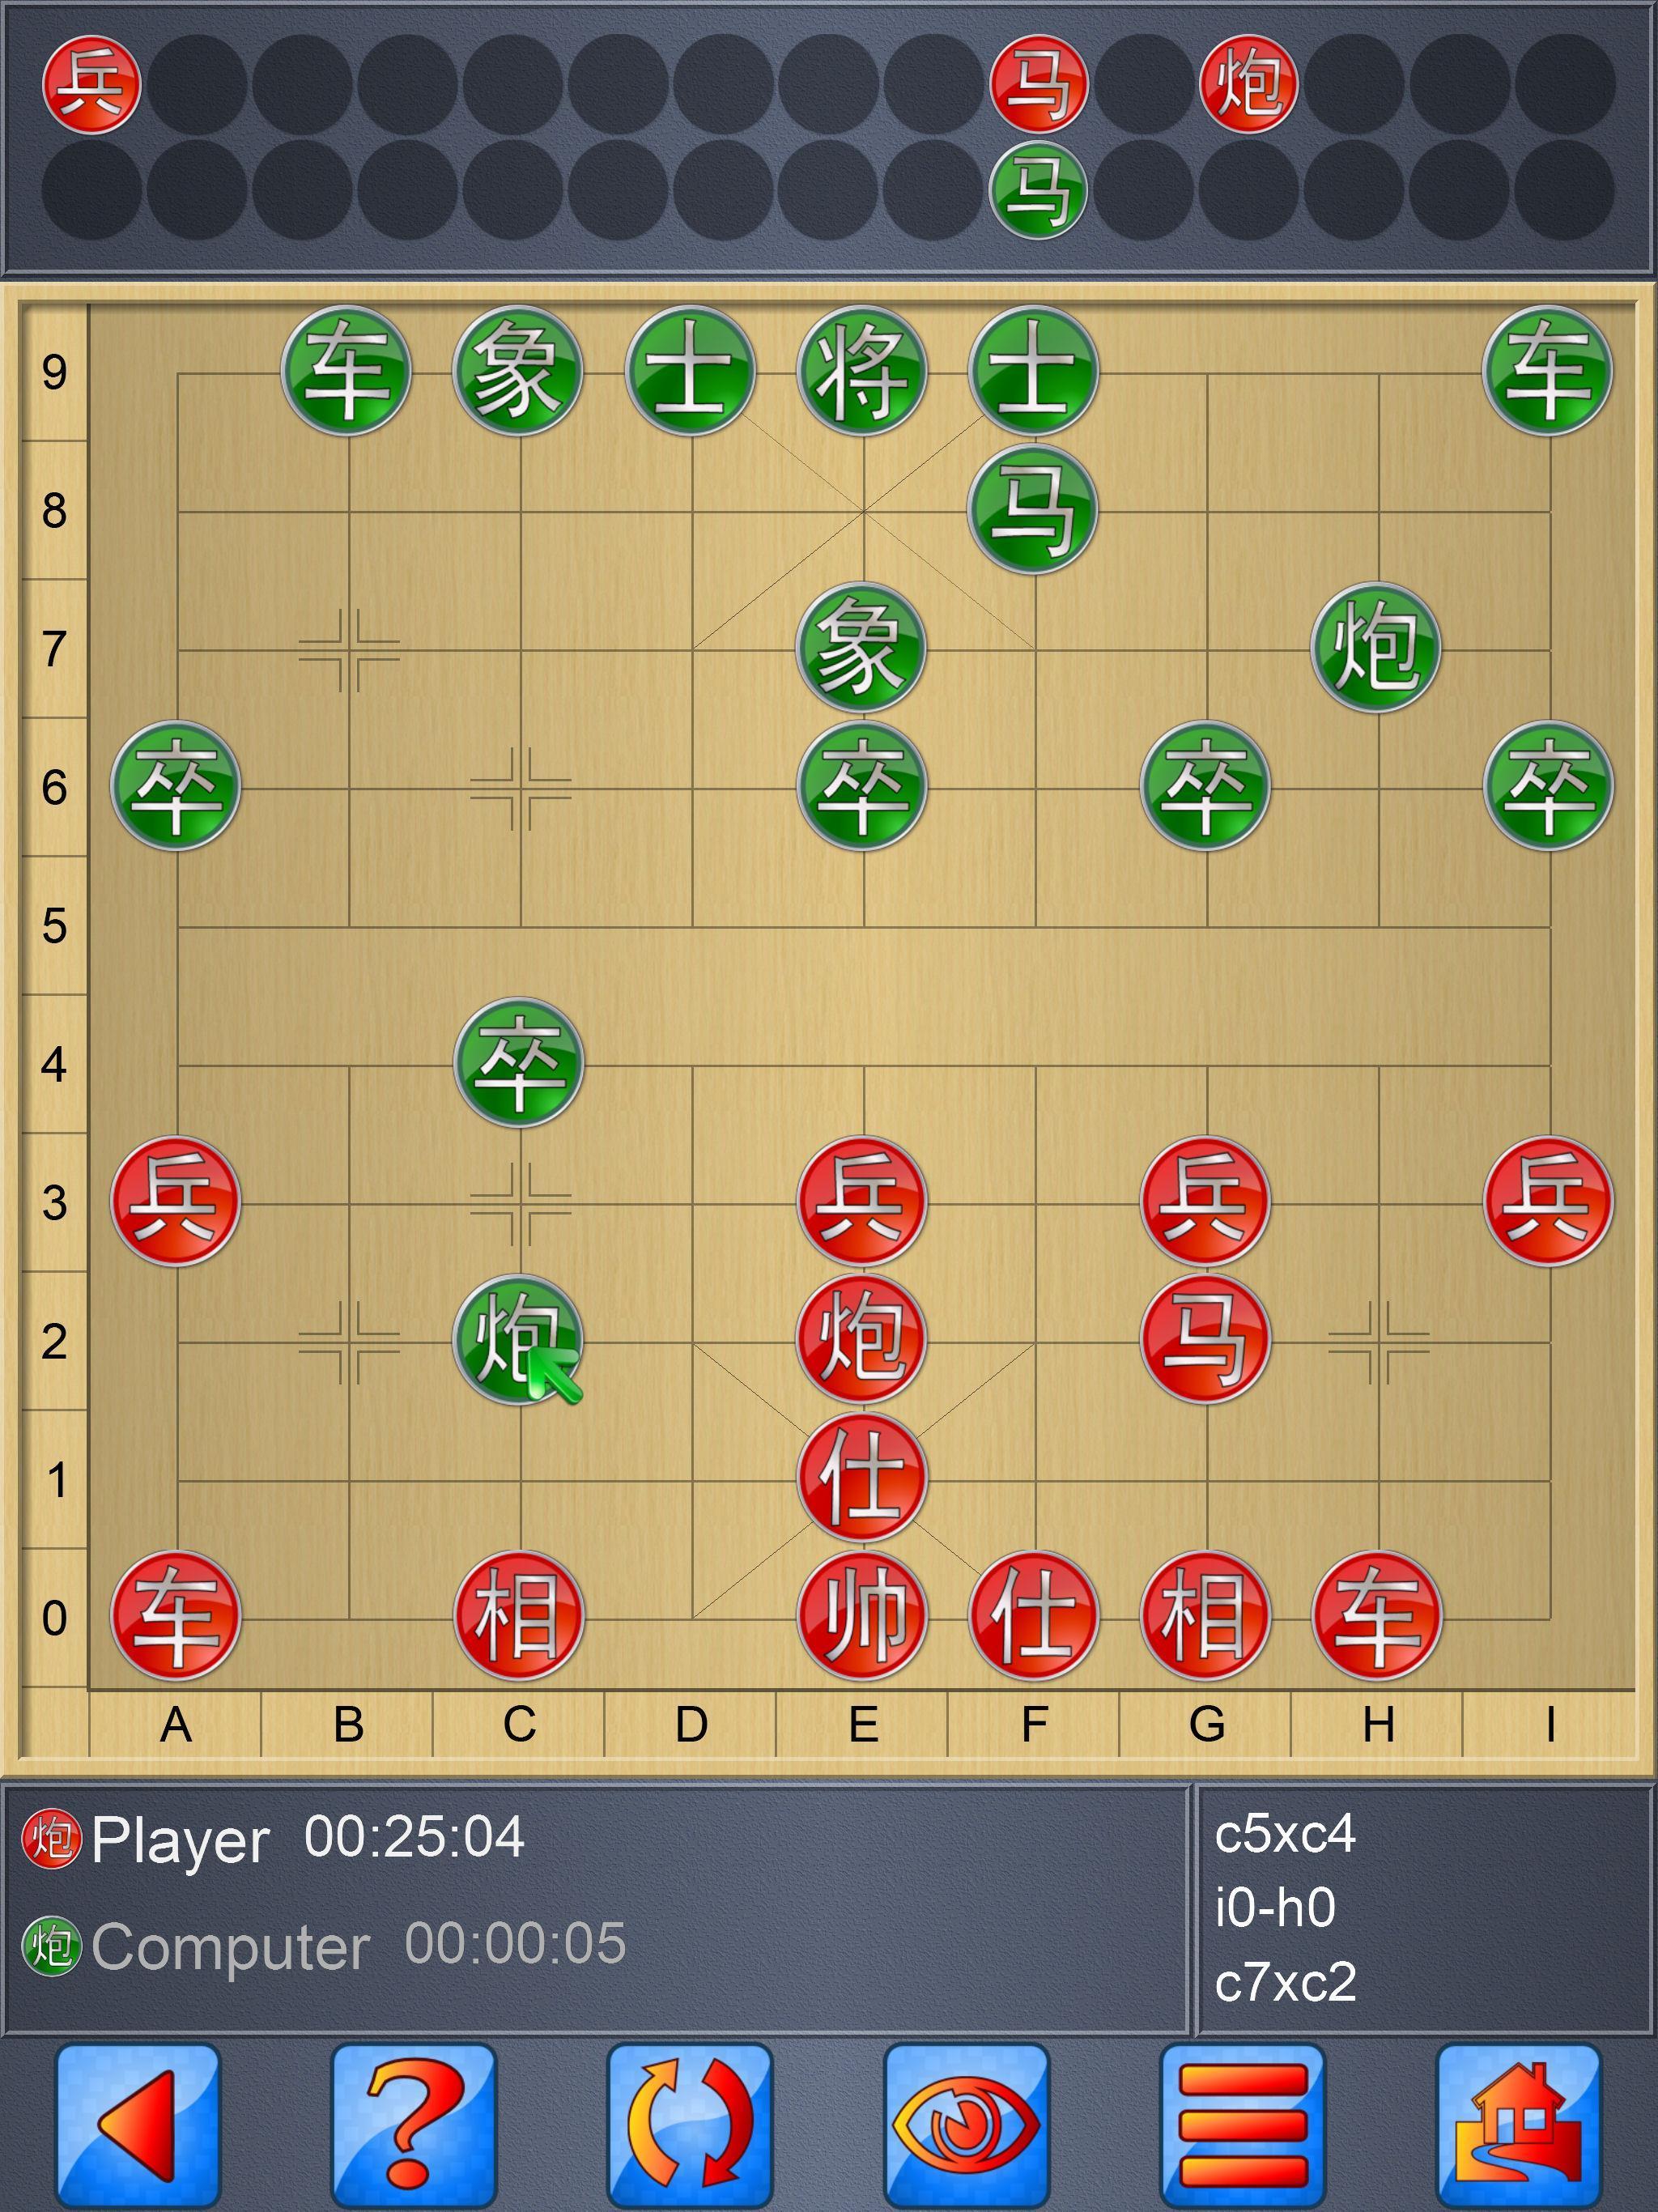 Chinese Chess V+, multiplayer Xiangqi board game 5.25.65 Screenshot 22